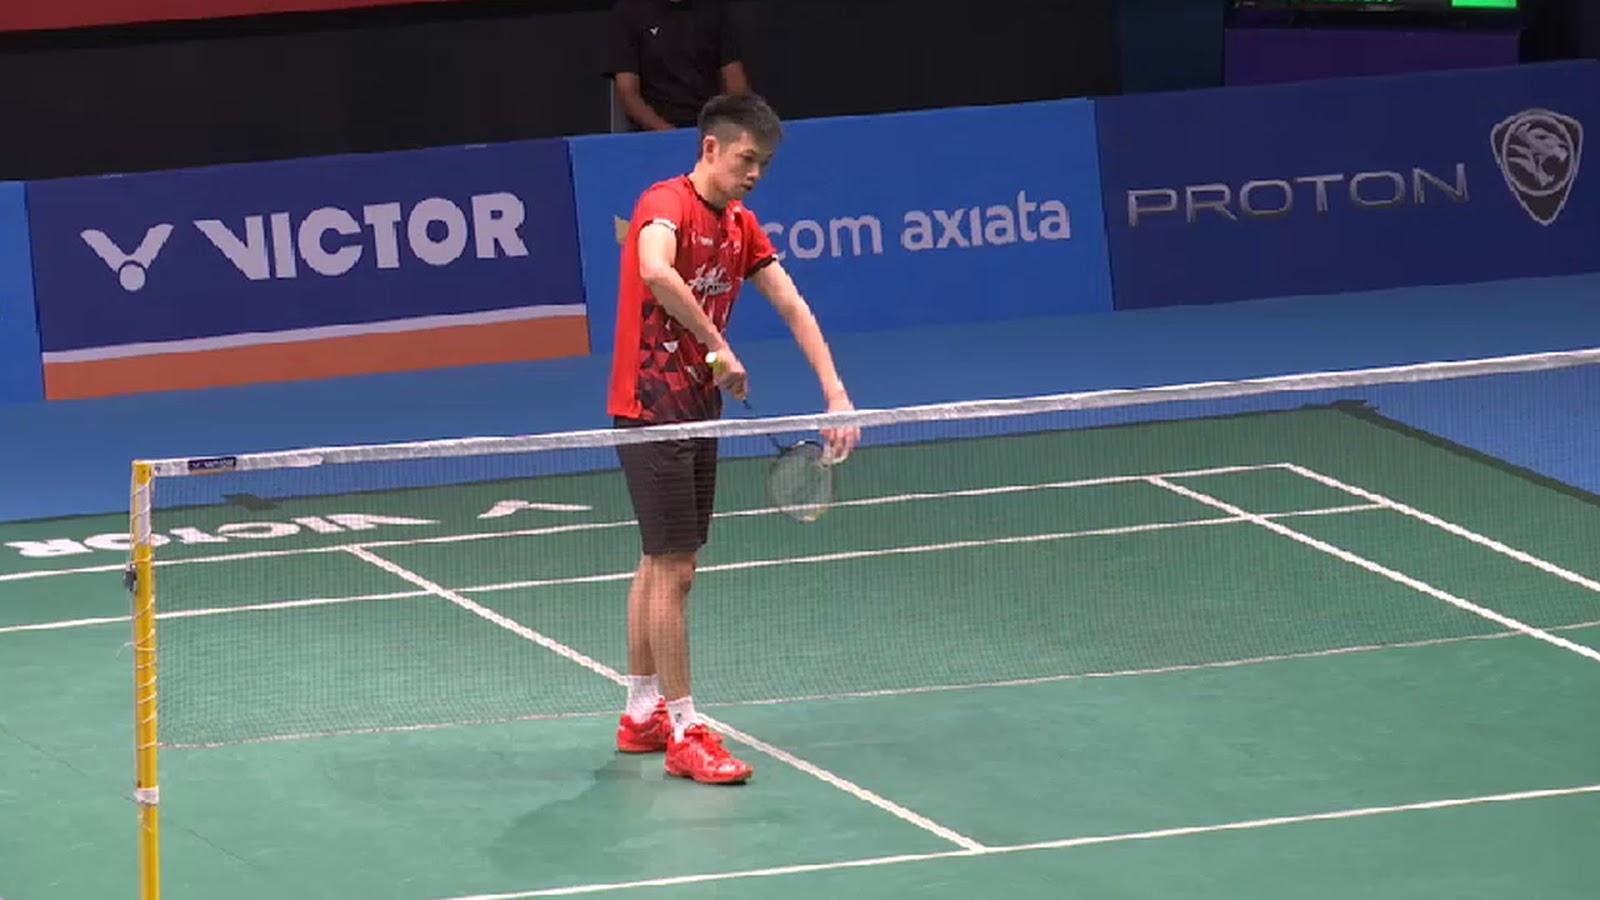 Pemain Badminton Negara Kejutkan Jaguh Dunia Oh Media